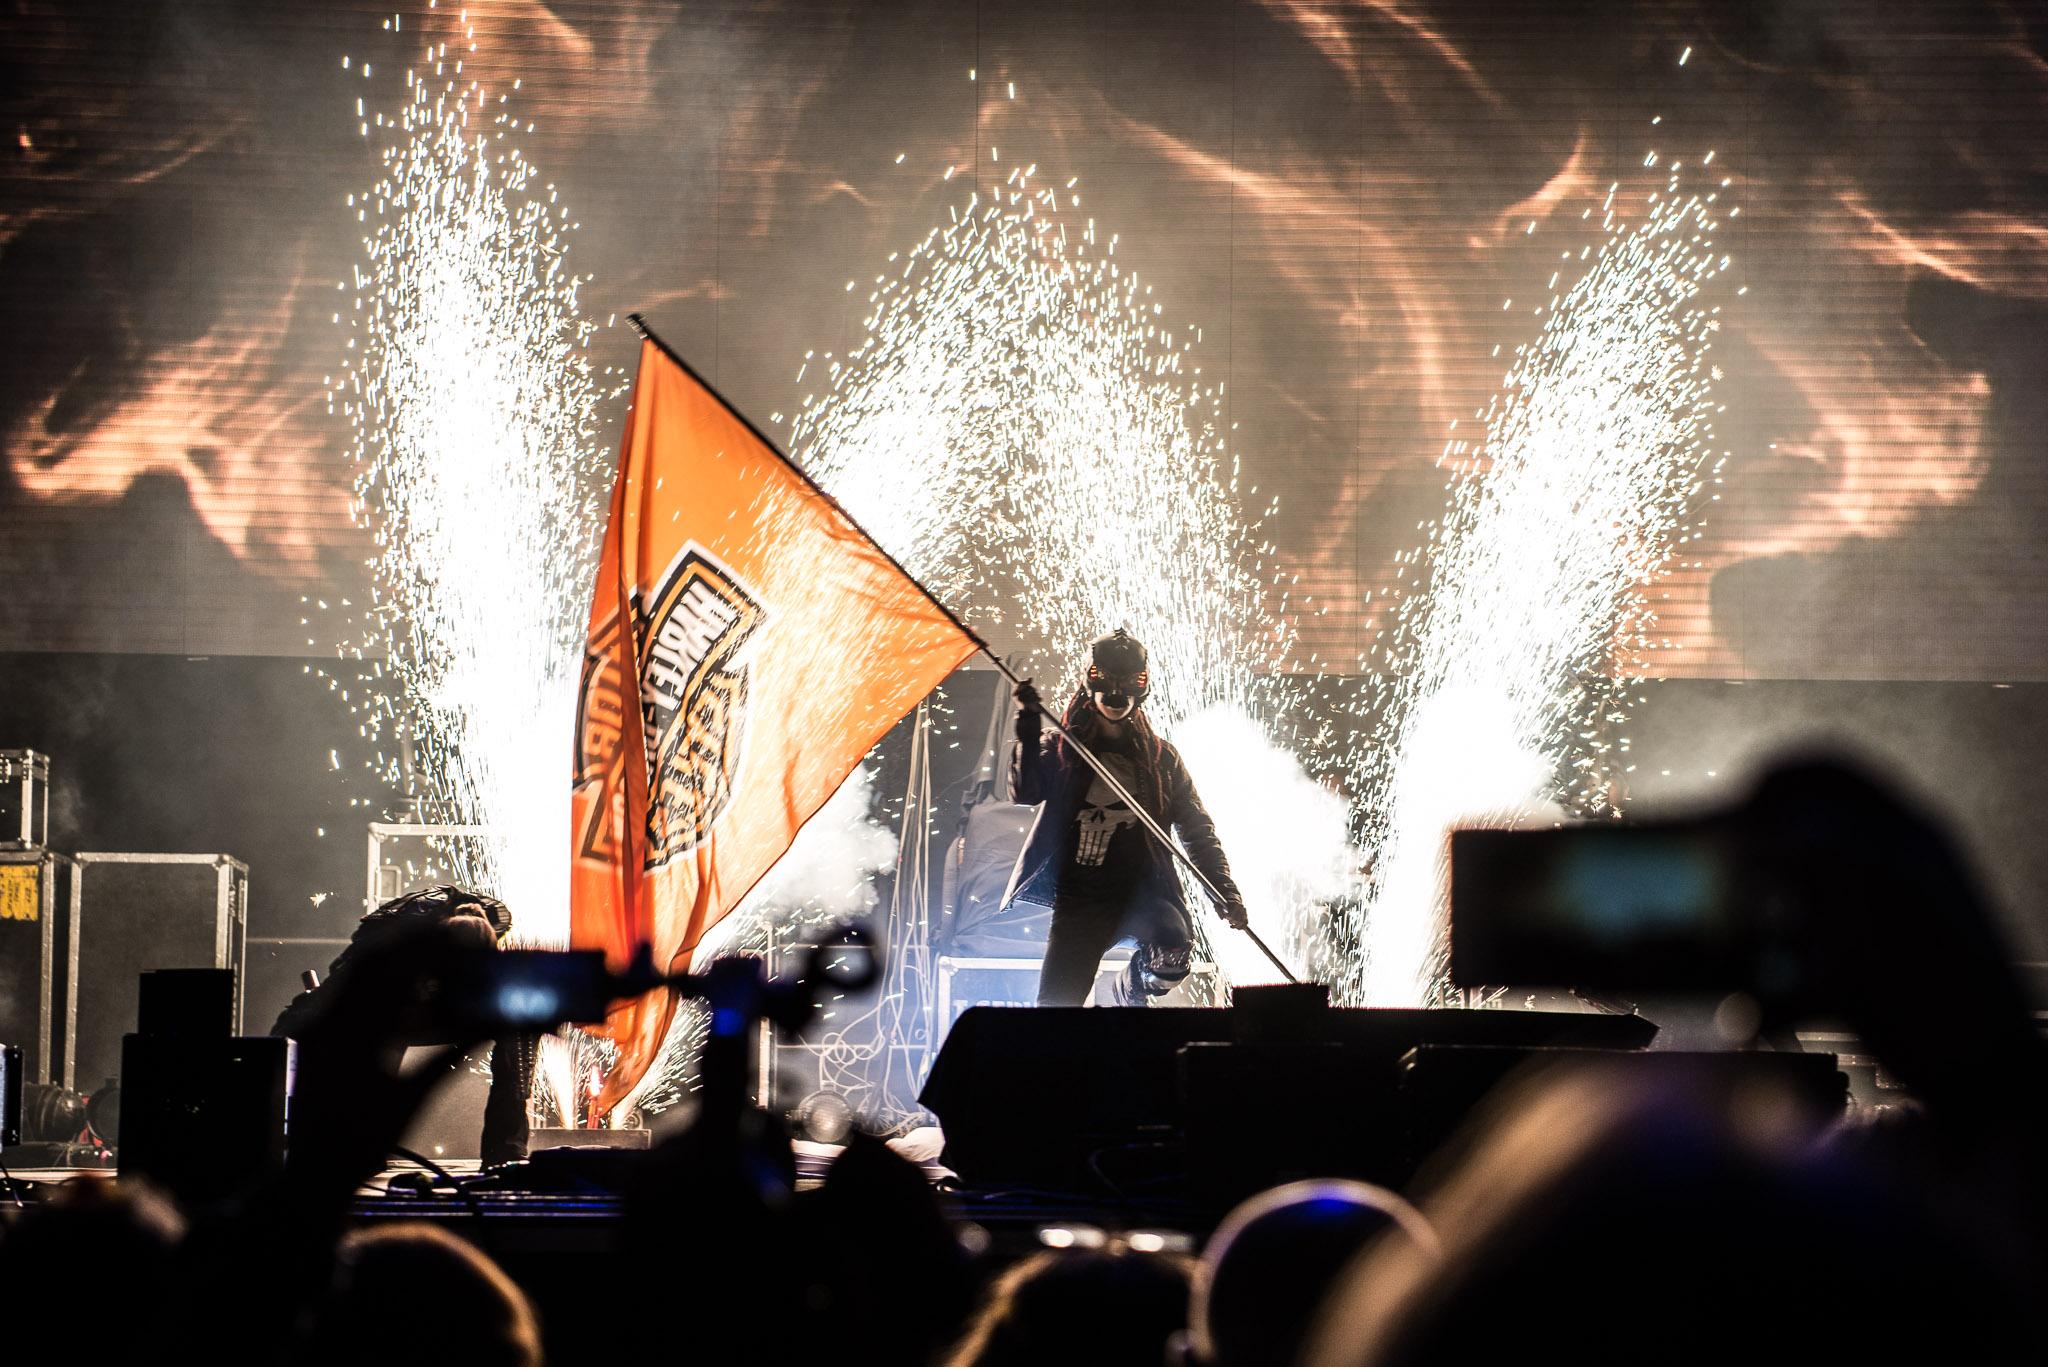 pyroterra pyro show, pyrotechnics fireshow - pyrotechnická show_Harley Davidson_Openning_megashow